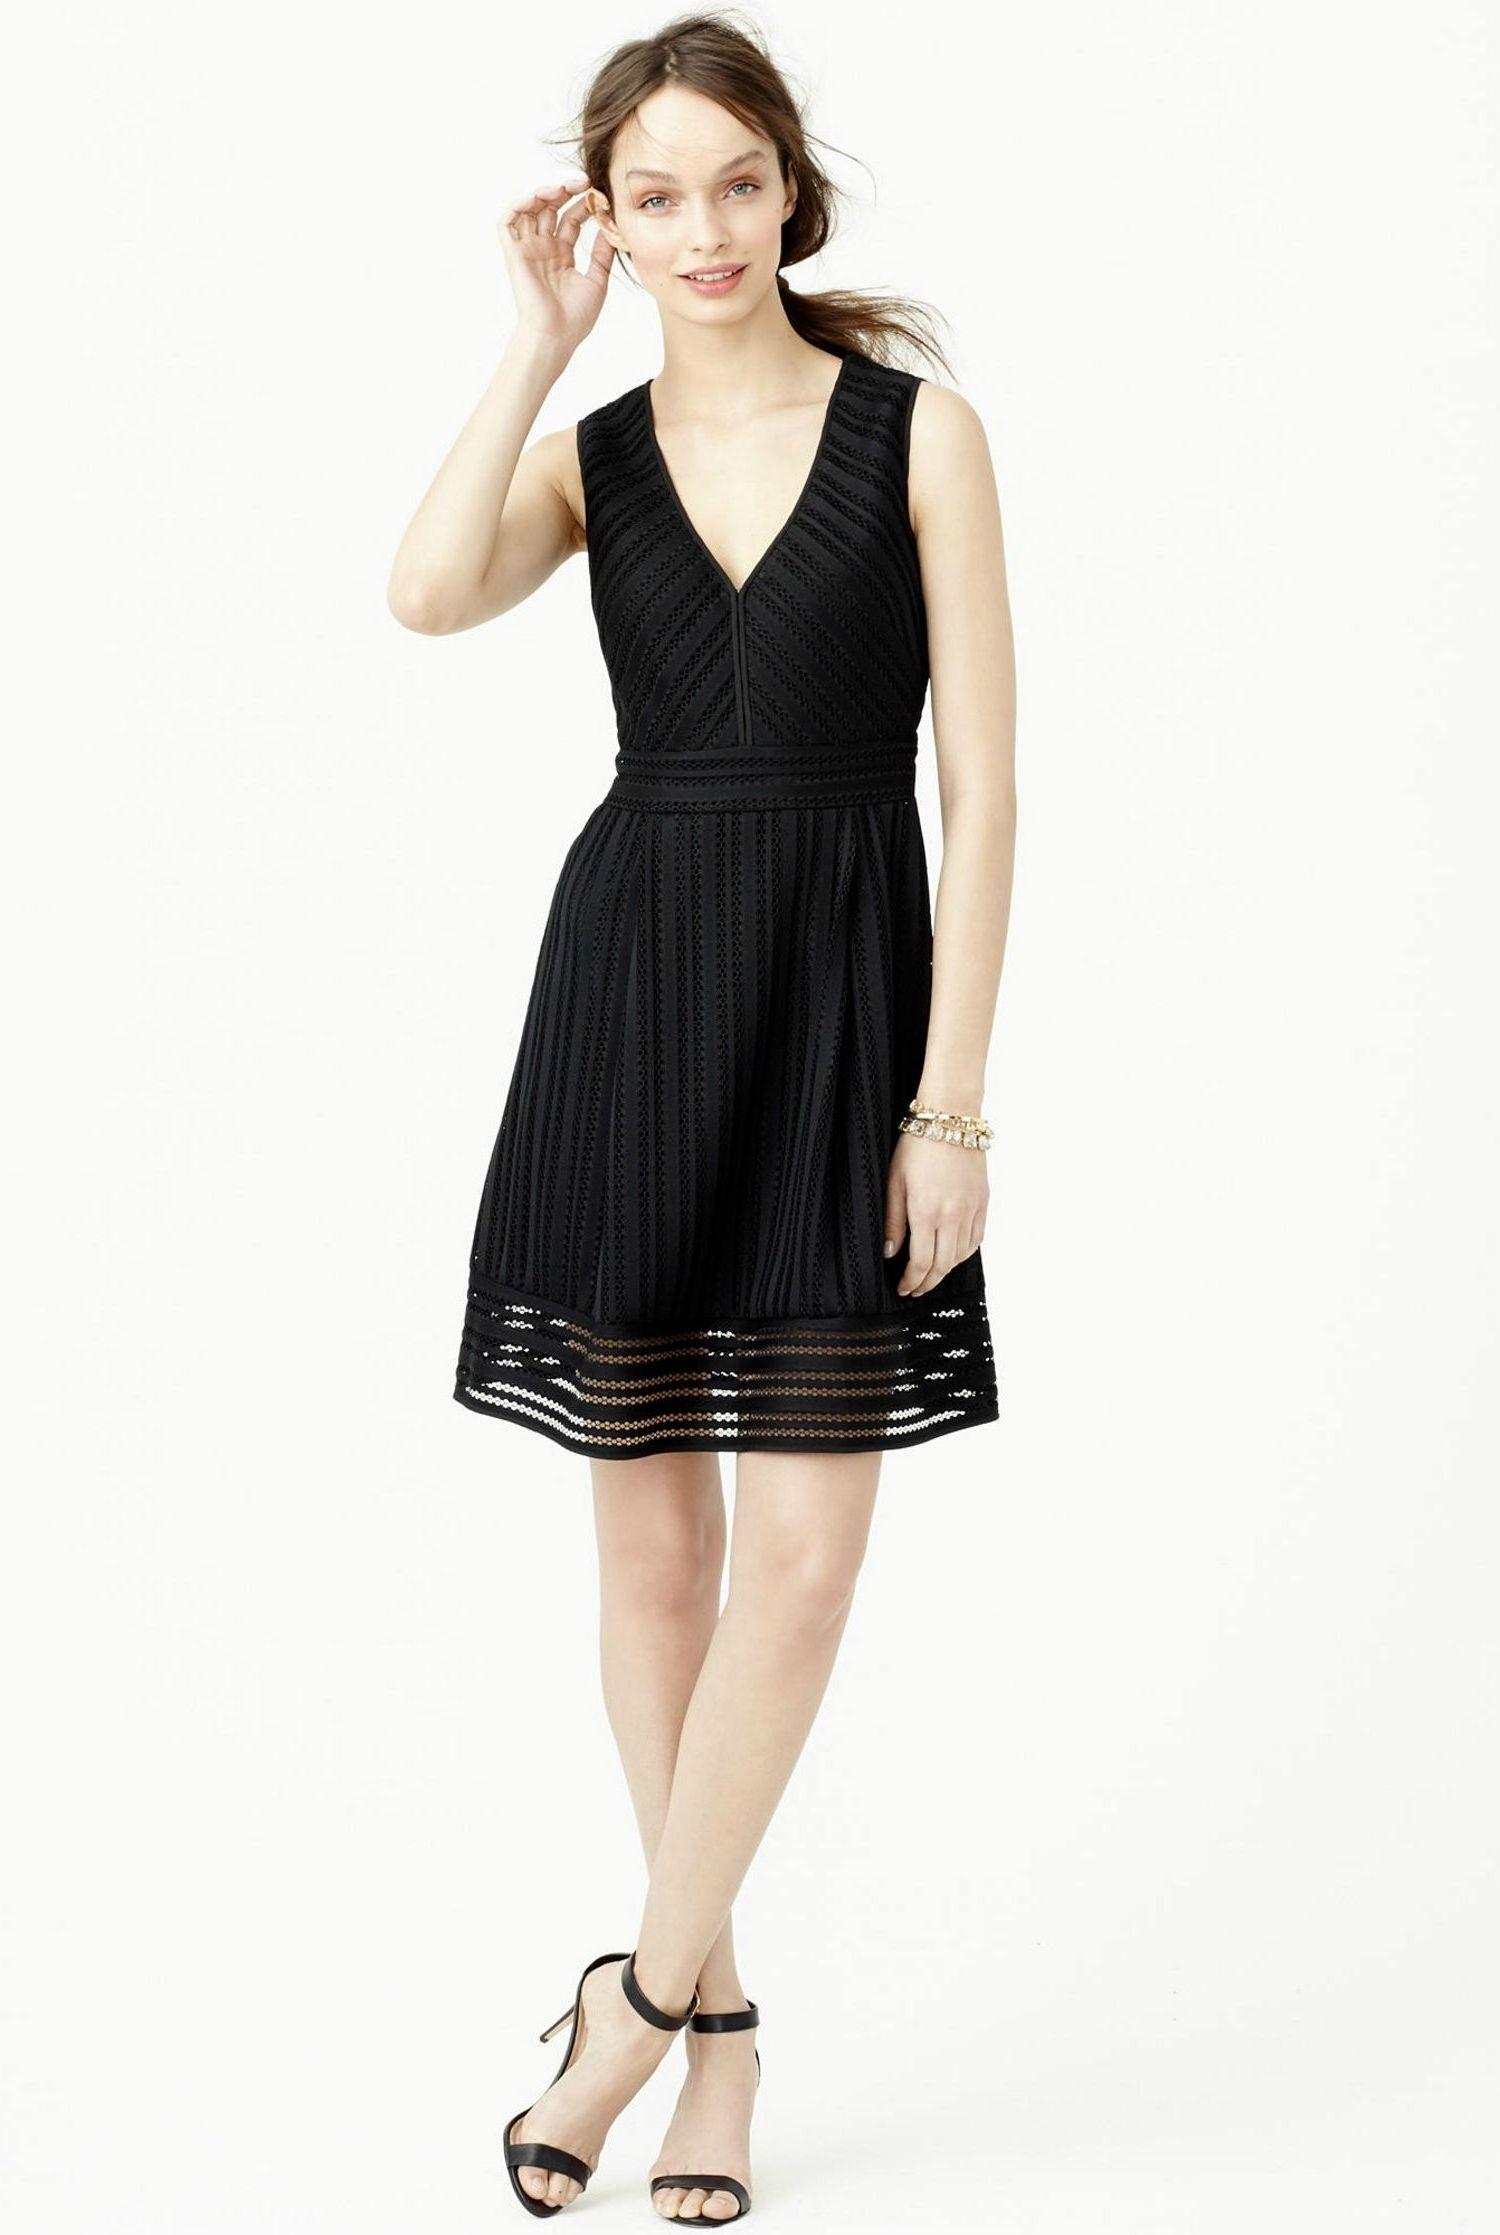 Little Black Dress For Summer Wedding | Wedding Dress | Pinterest ...